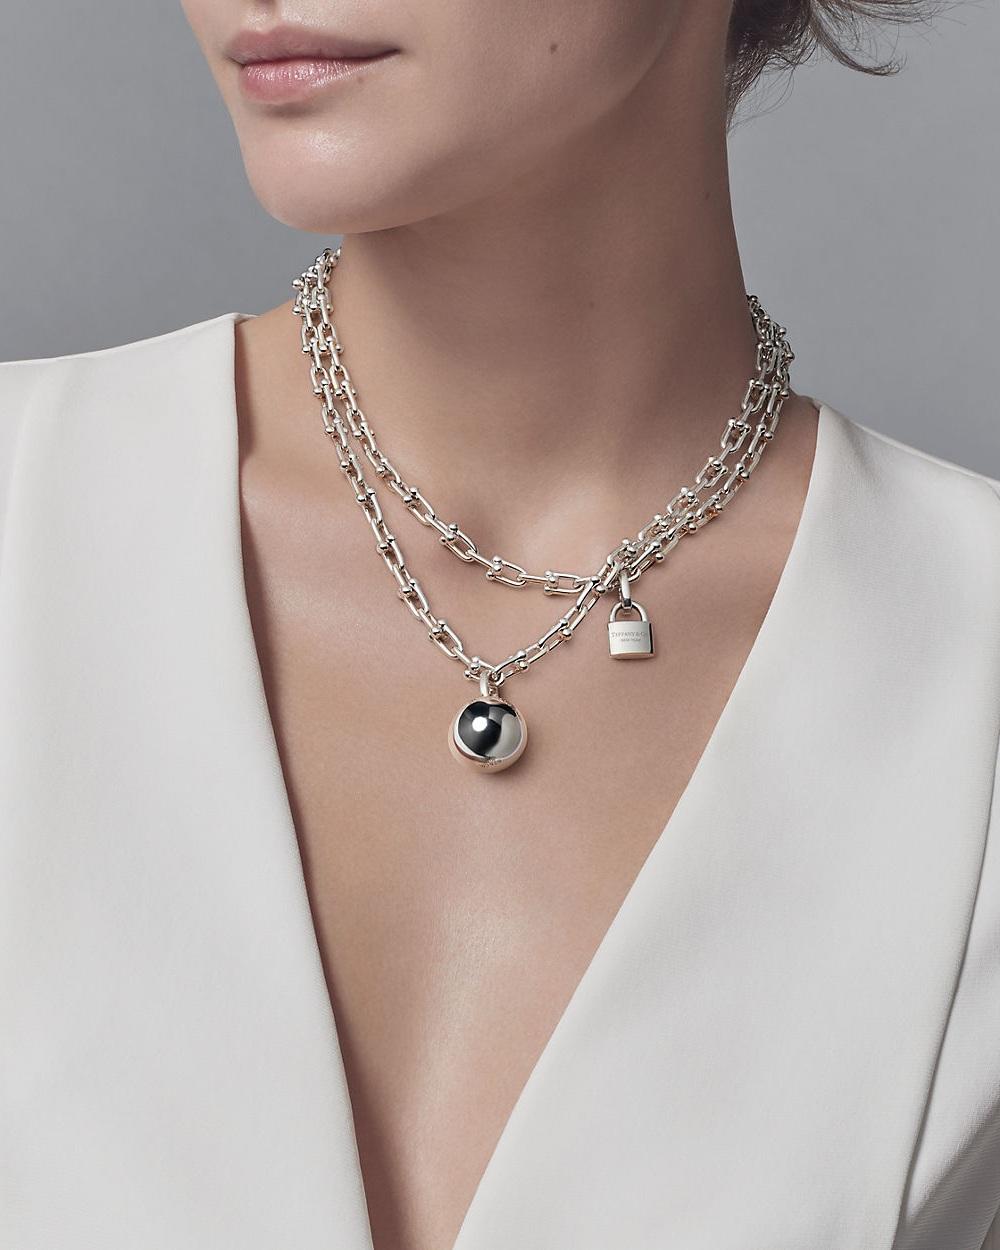 tiffany-hardwearwrap-necklace-38172794_981044_SV_1_M.jpg